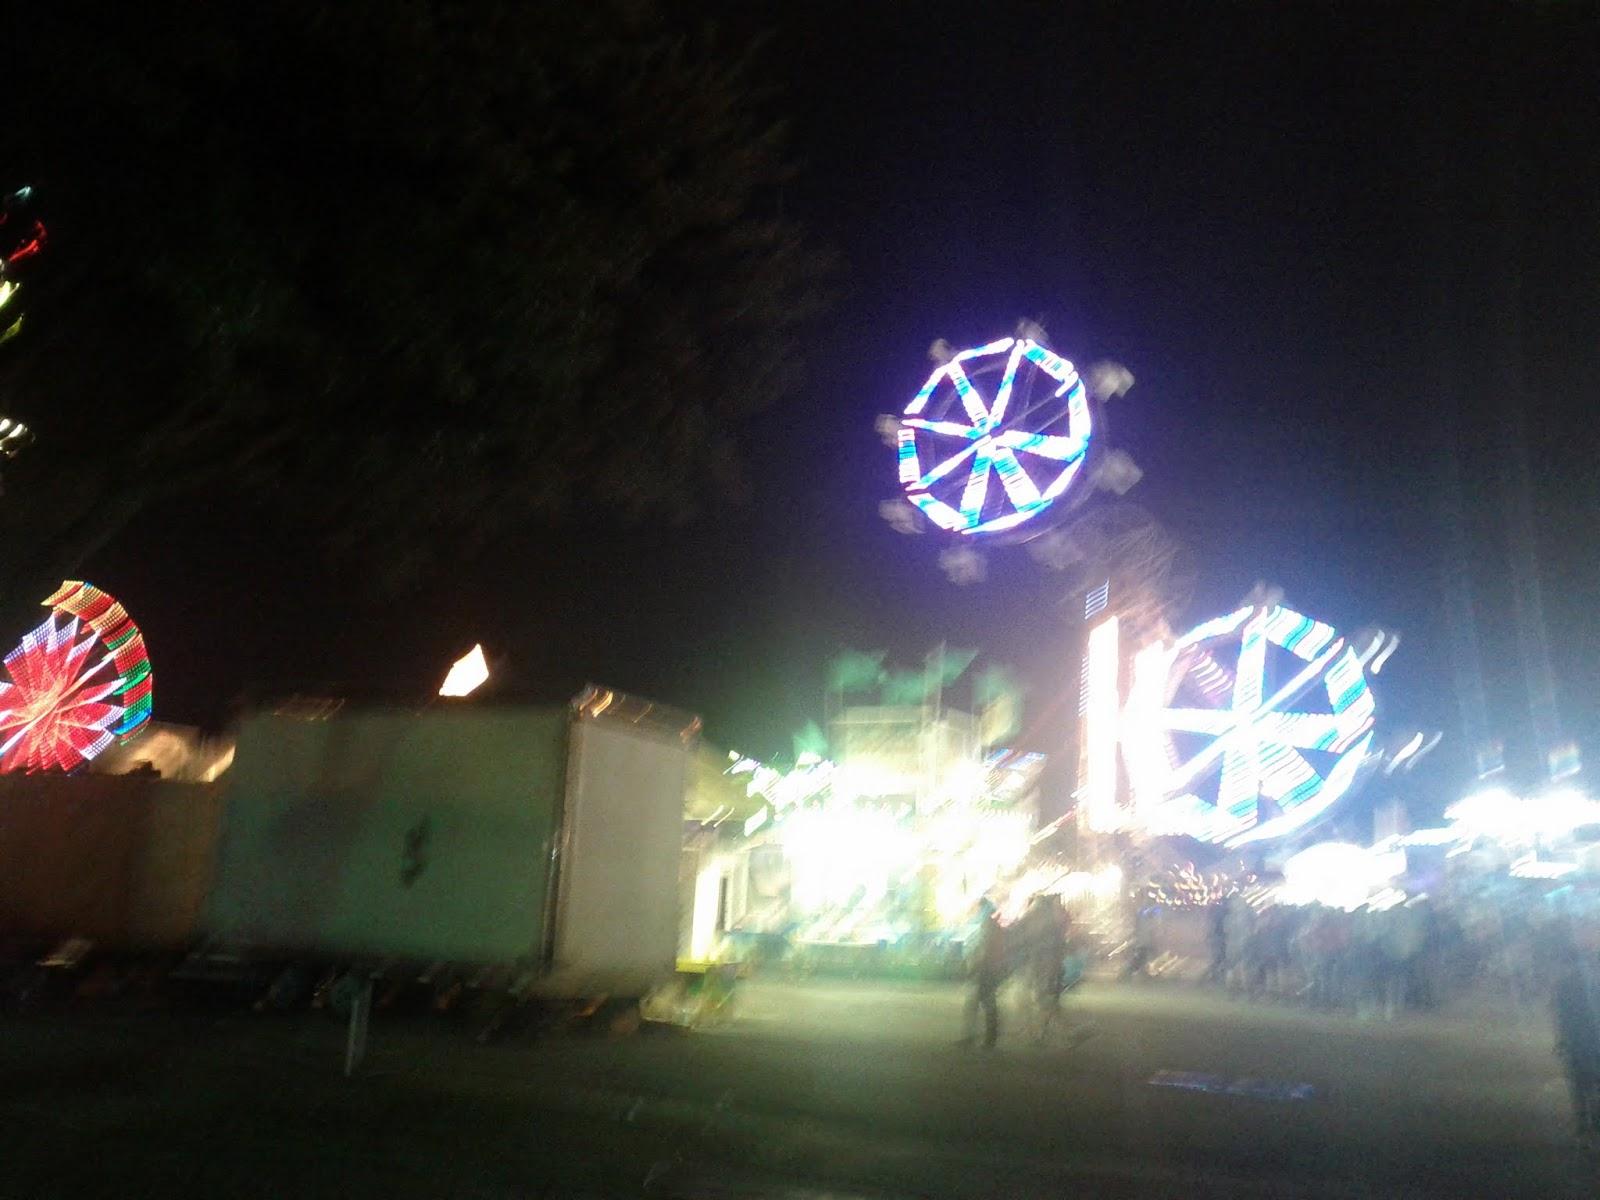 Fort Bend County Fair 2012 - IMG_20121006_194718.jpg